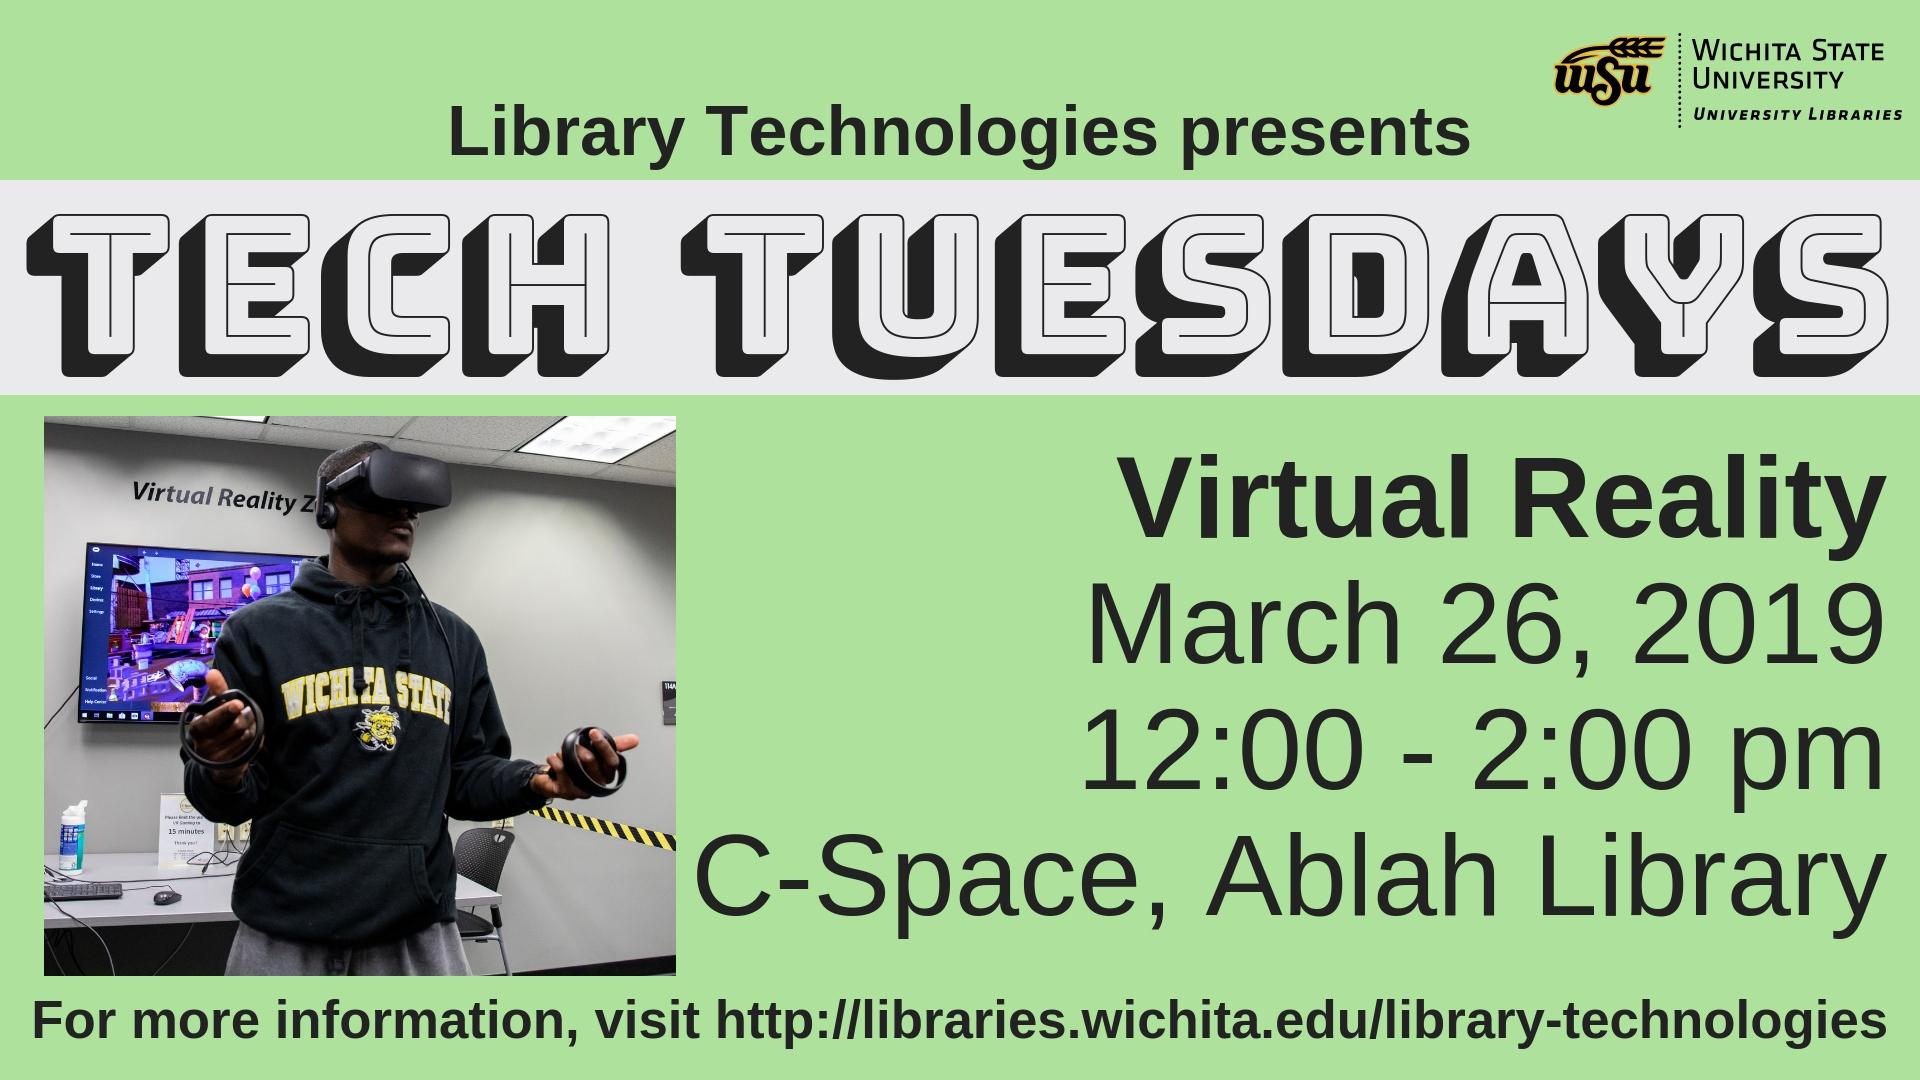 Tech Tuesdays: Virtual Reality